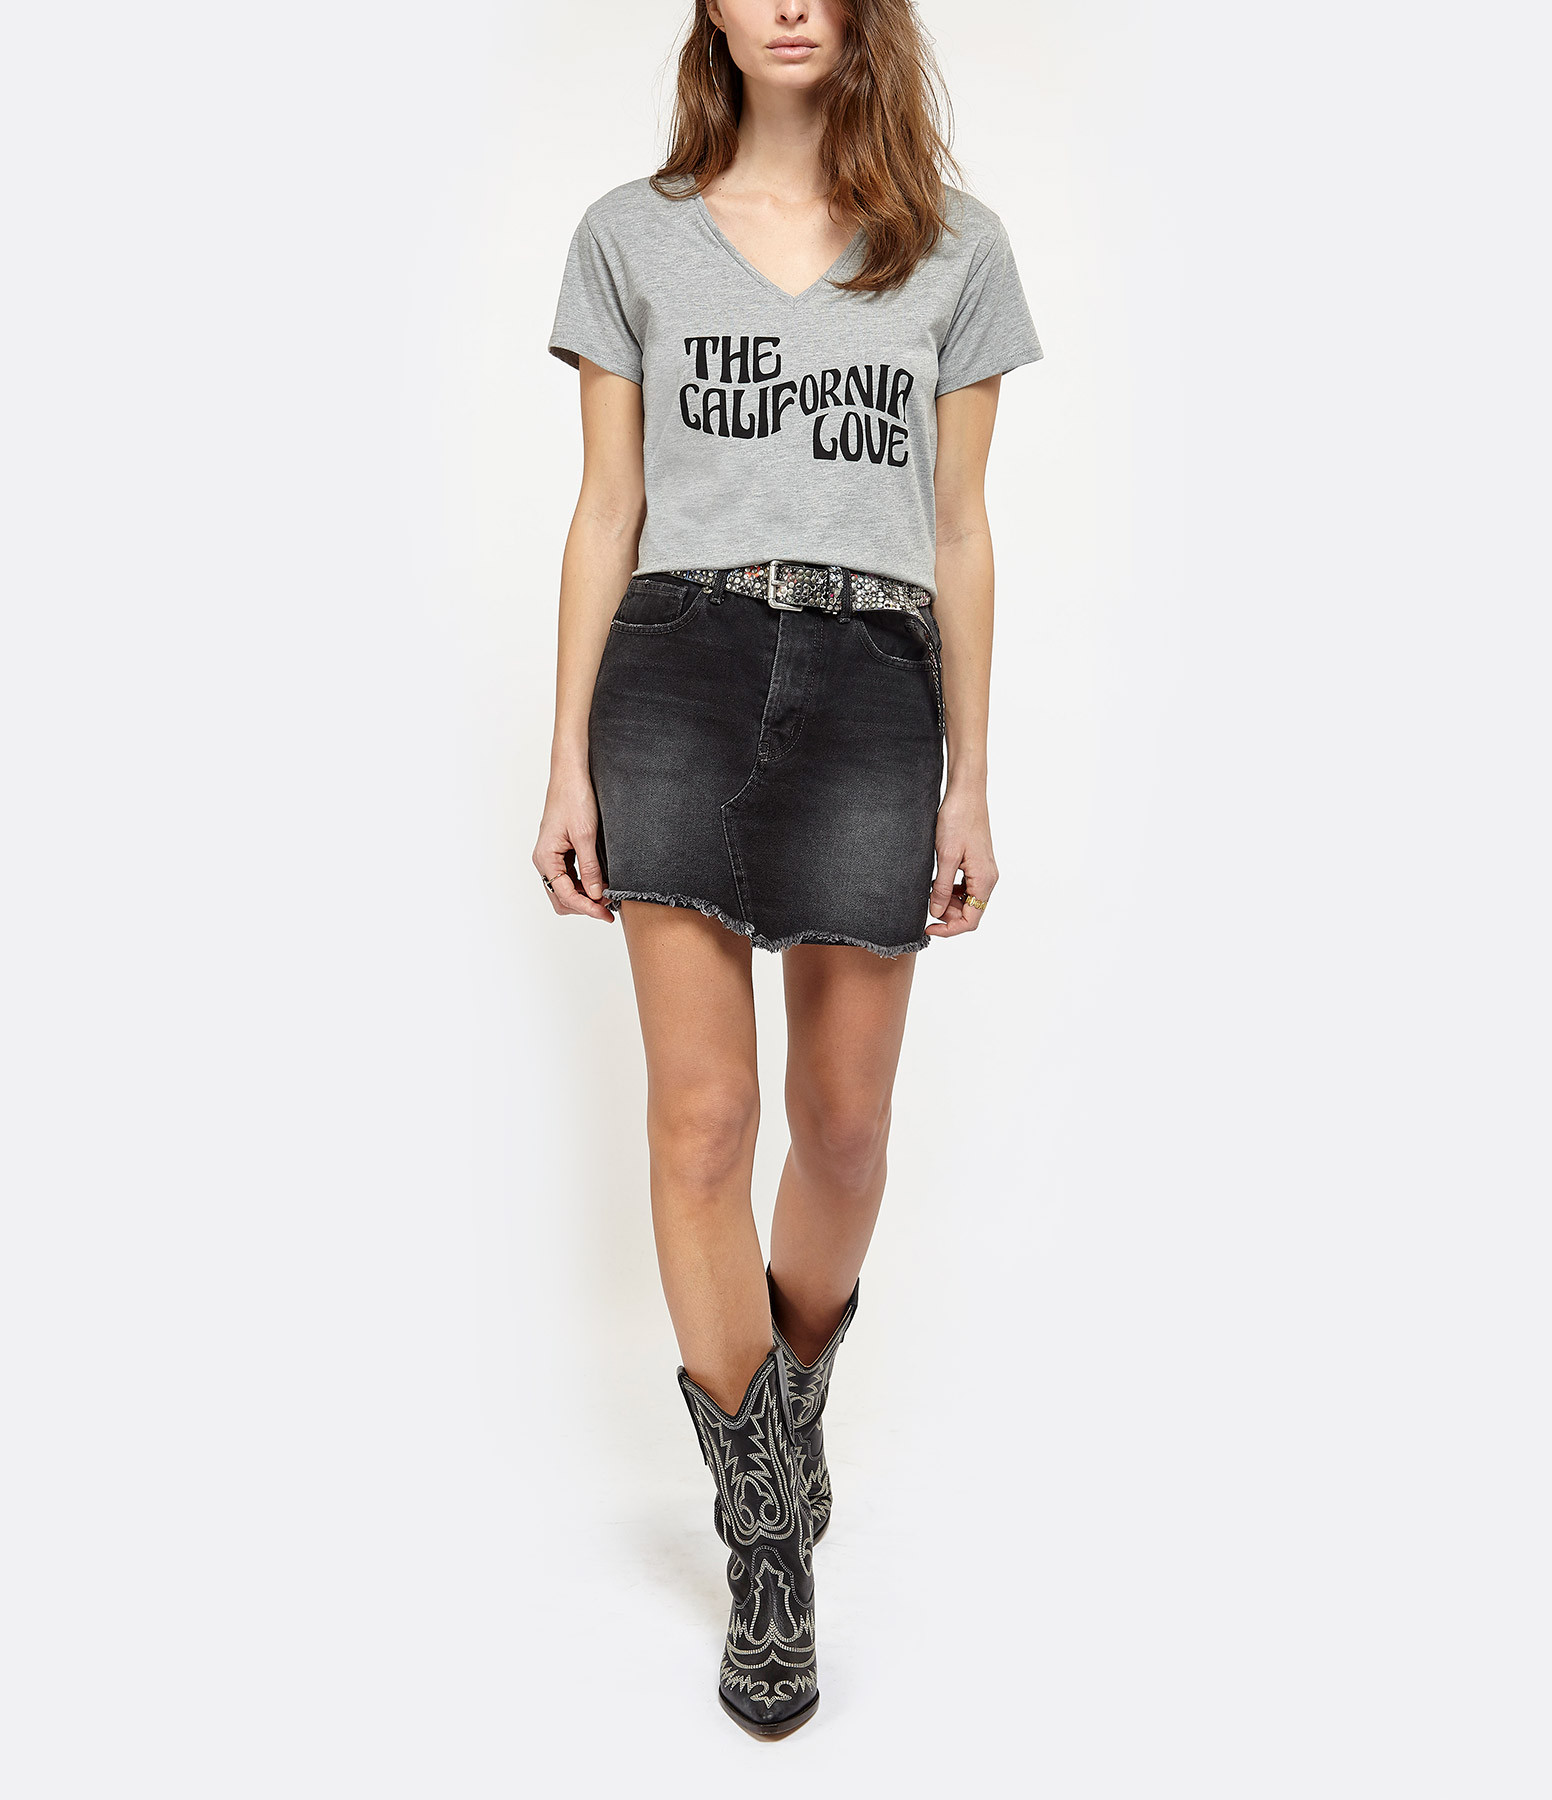 JEANNE VOULAND - Tee-Shirt Dohan California Love Gris